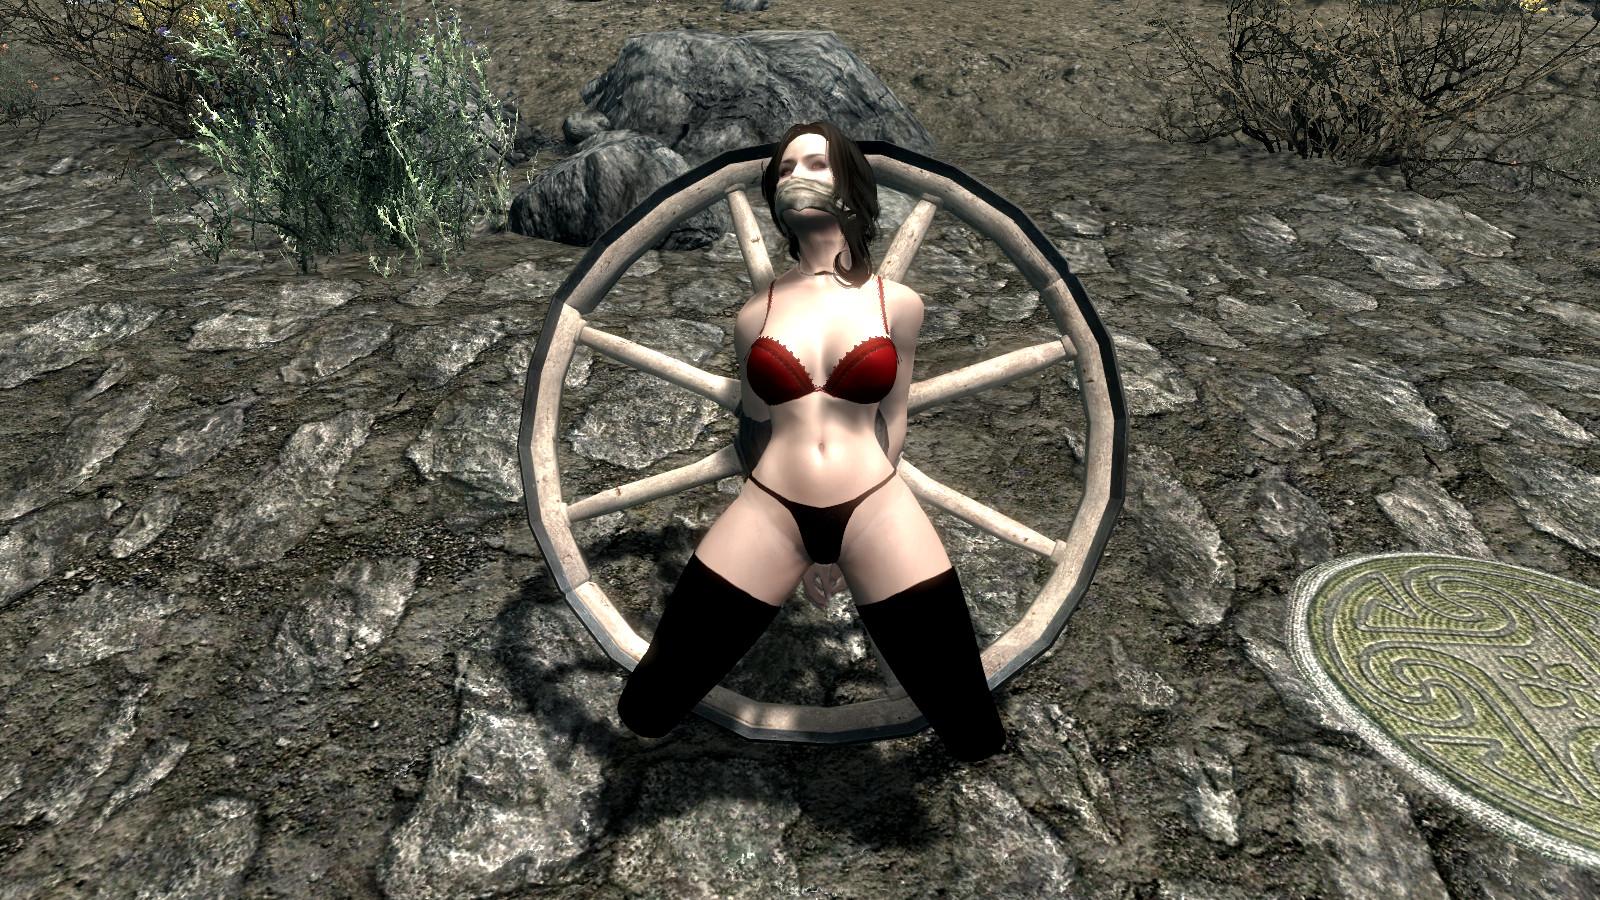 Oblivion bondage sex hentai image